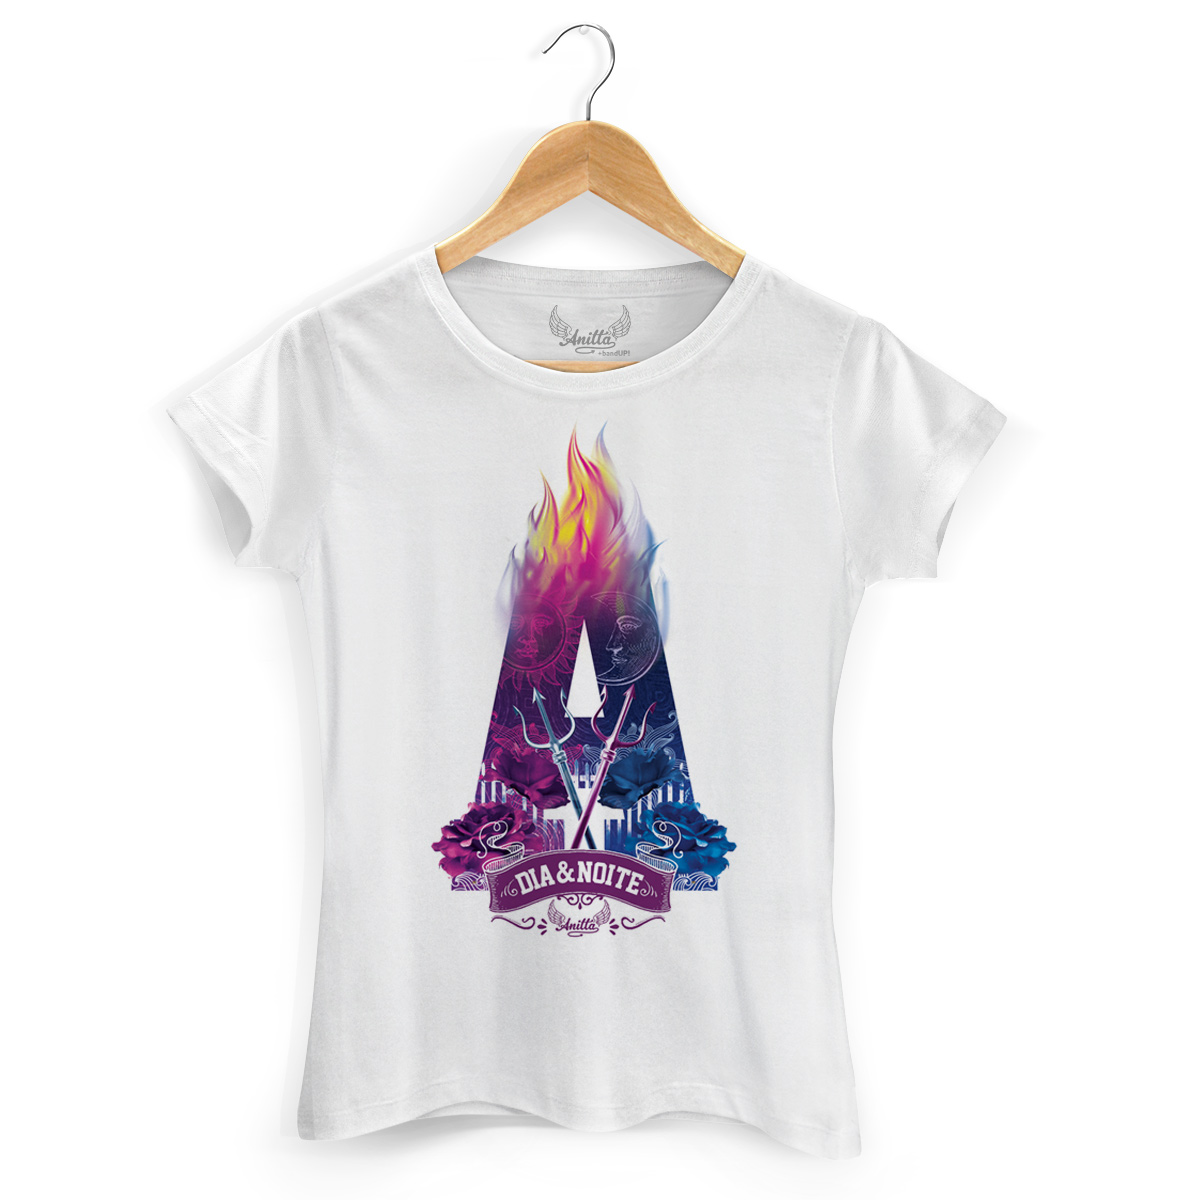 Camiseta Feminina Anitta Dia e Noite